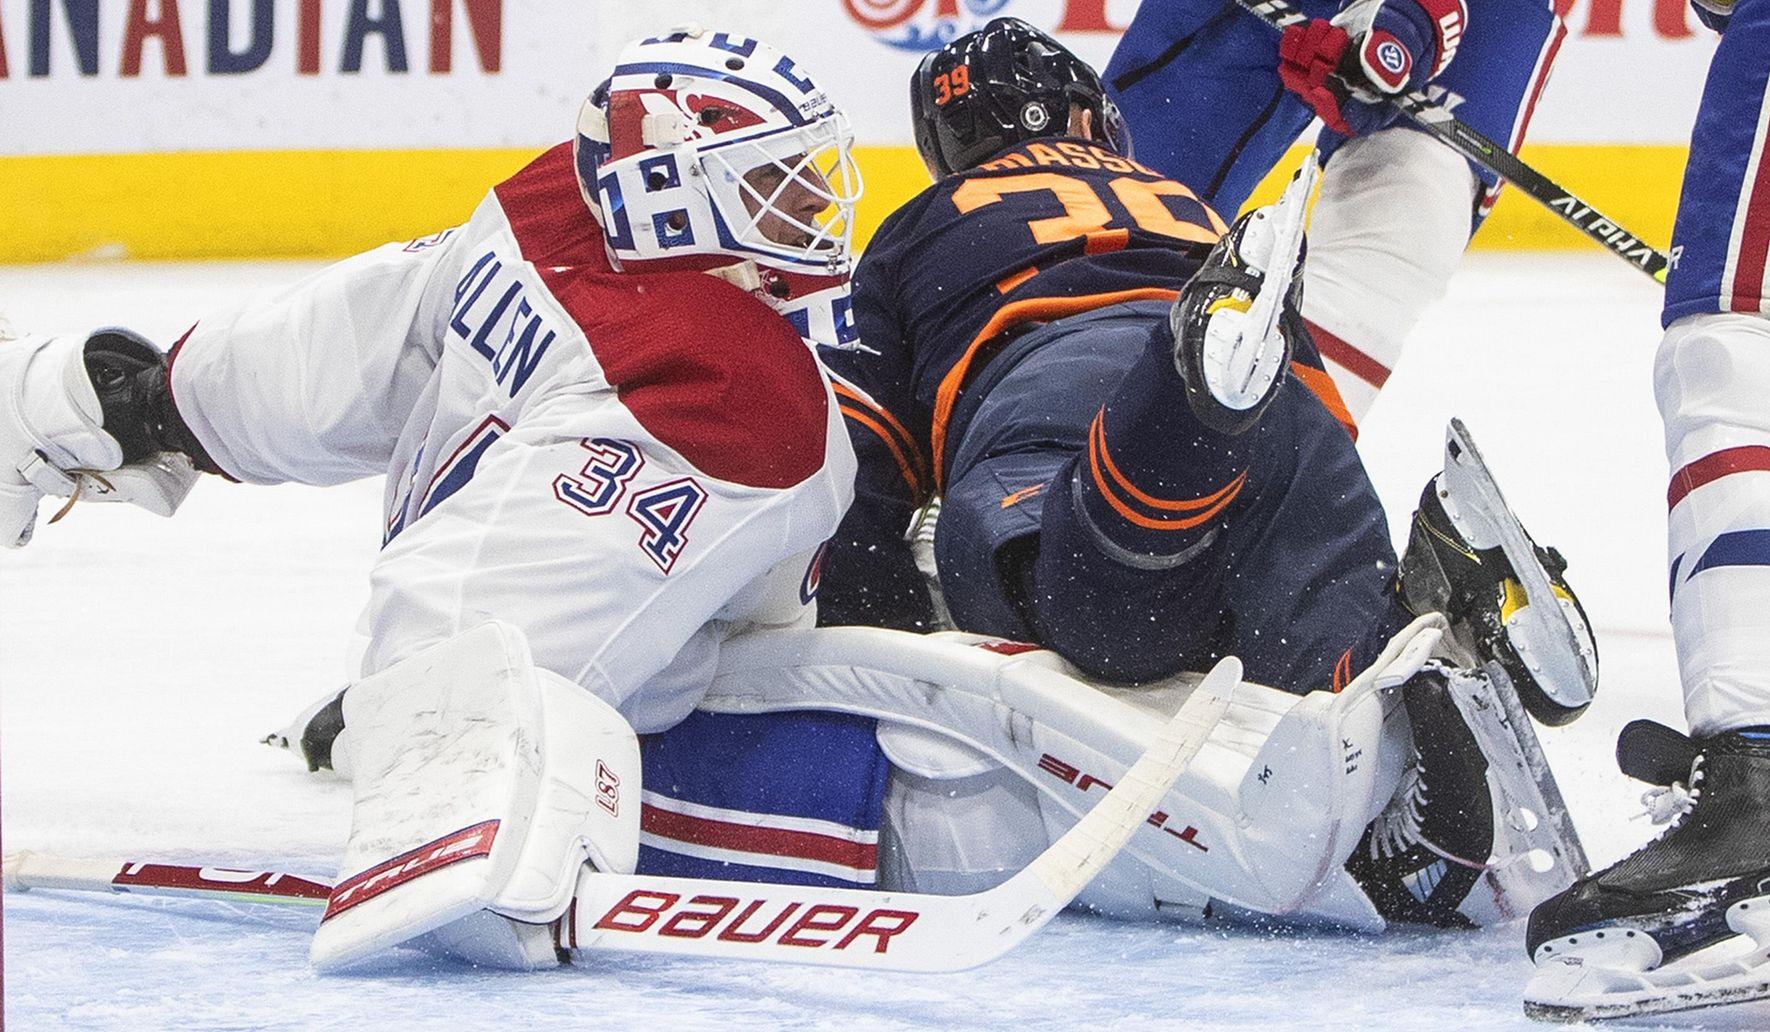 Canadiens_oilers_hockey_86024_c0-159-2851-1821_s1770x1032